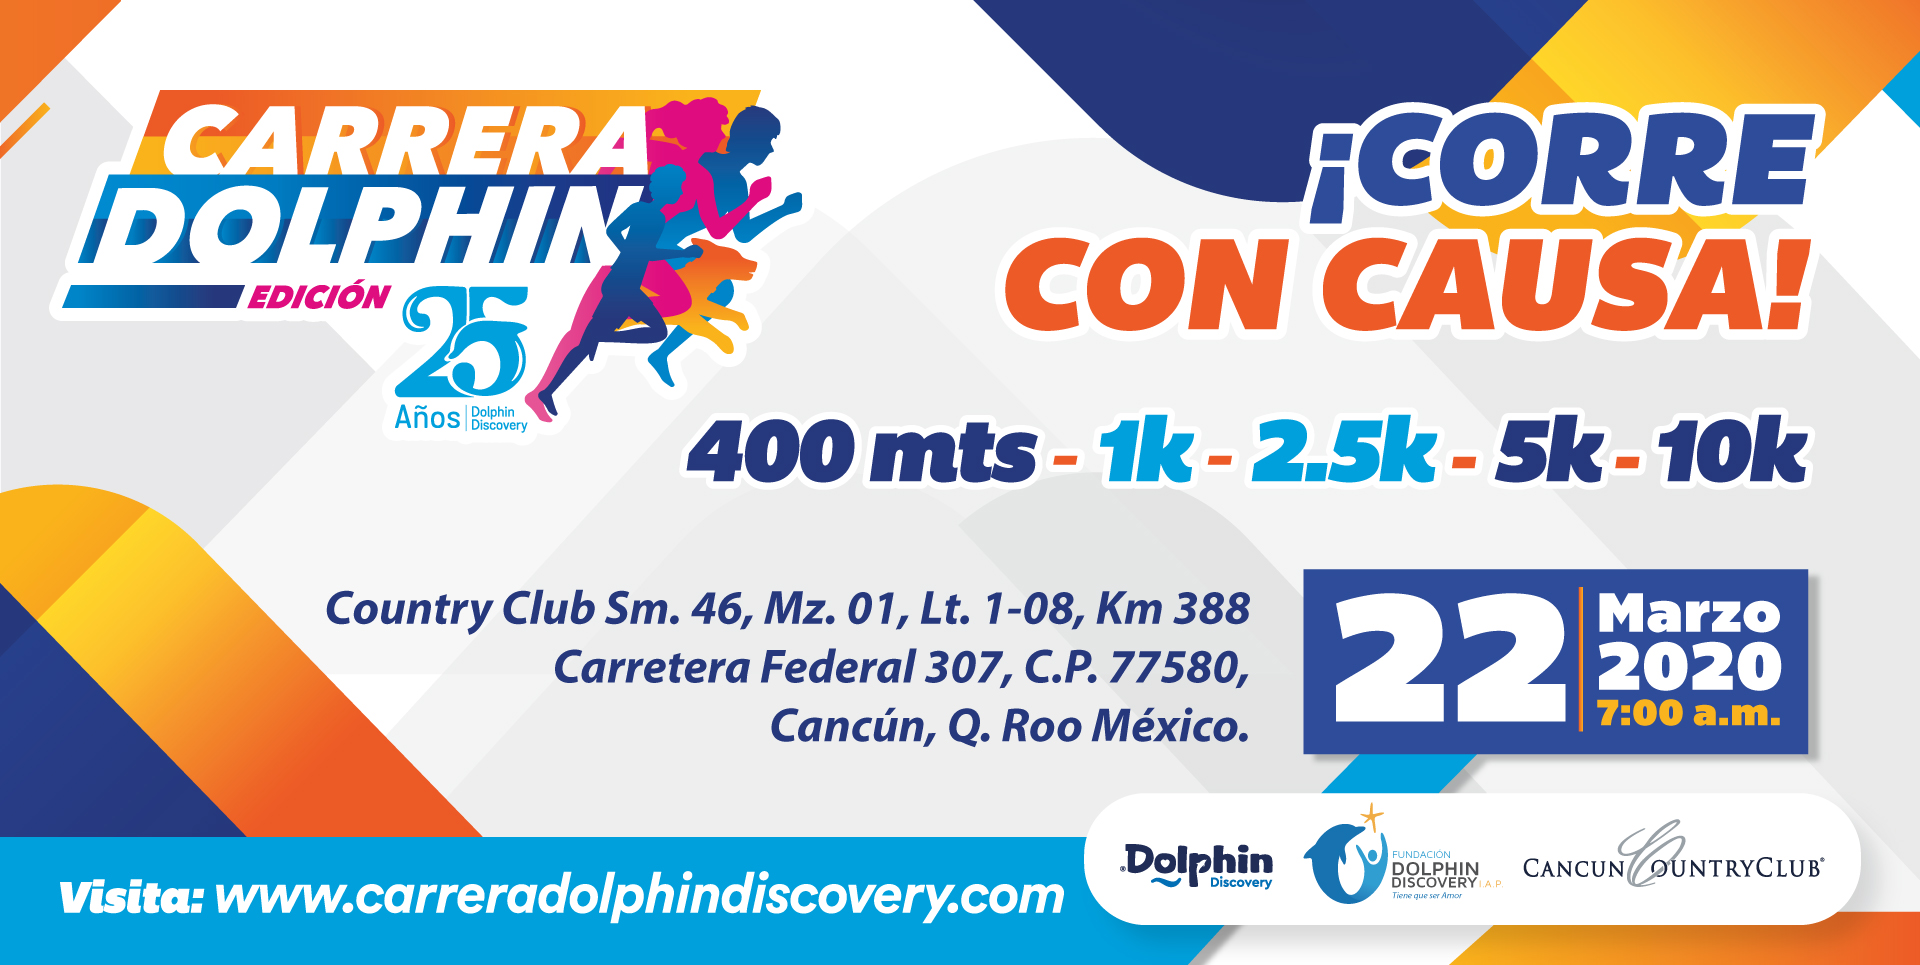 Carrera Dolphin Discovery